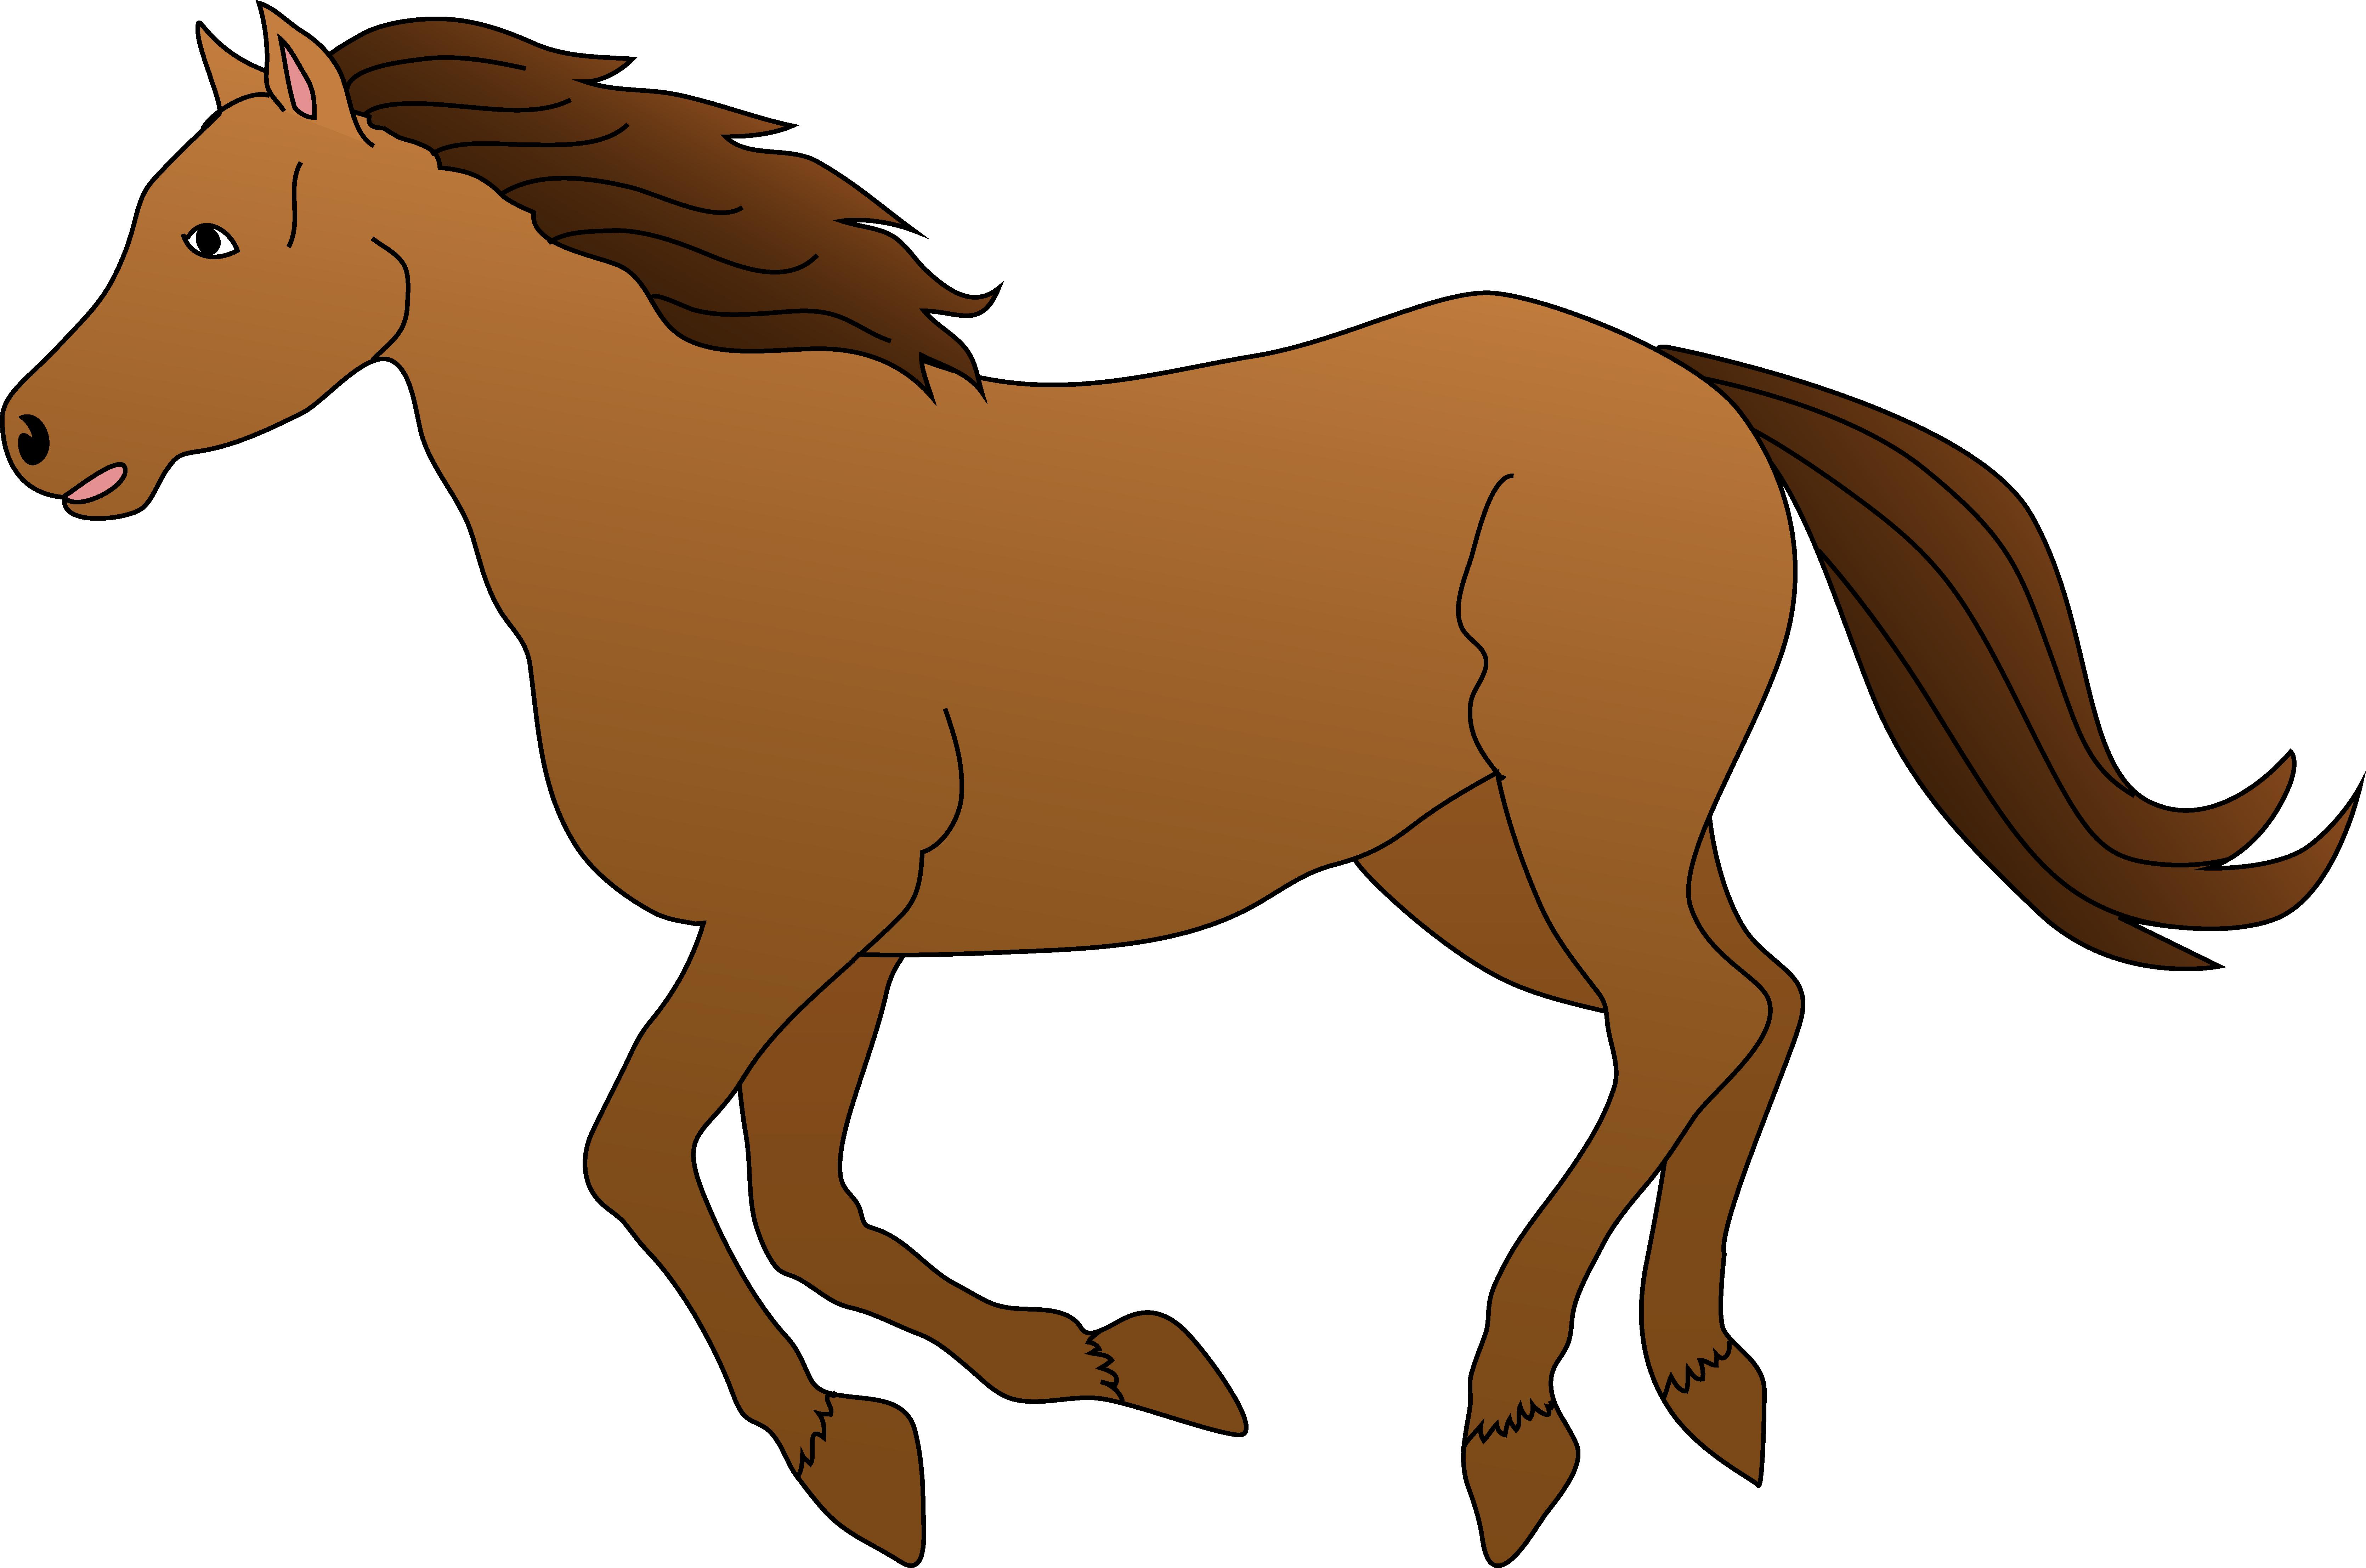 Horse clipart image horse clip art pictures 3